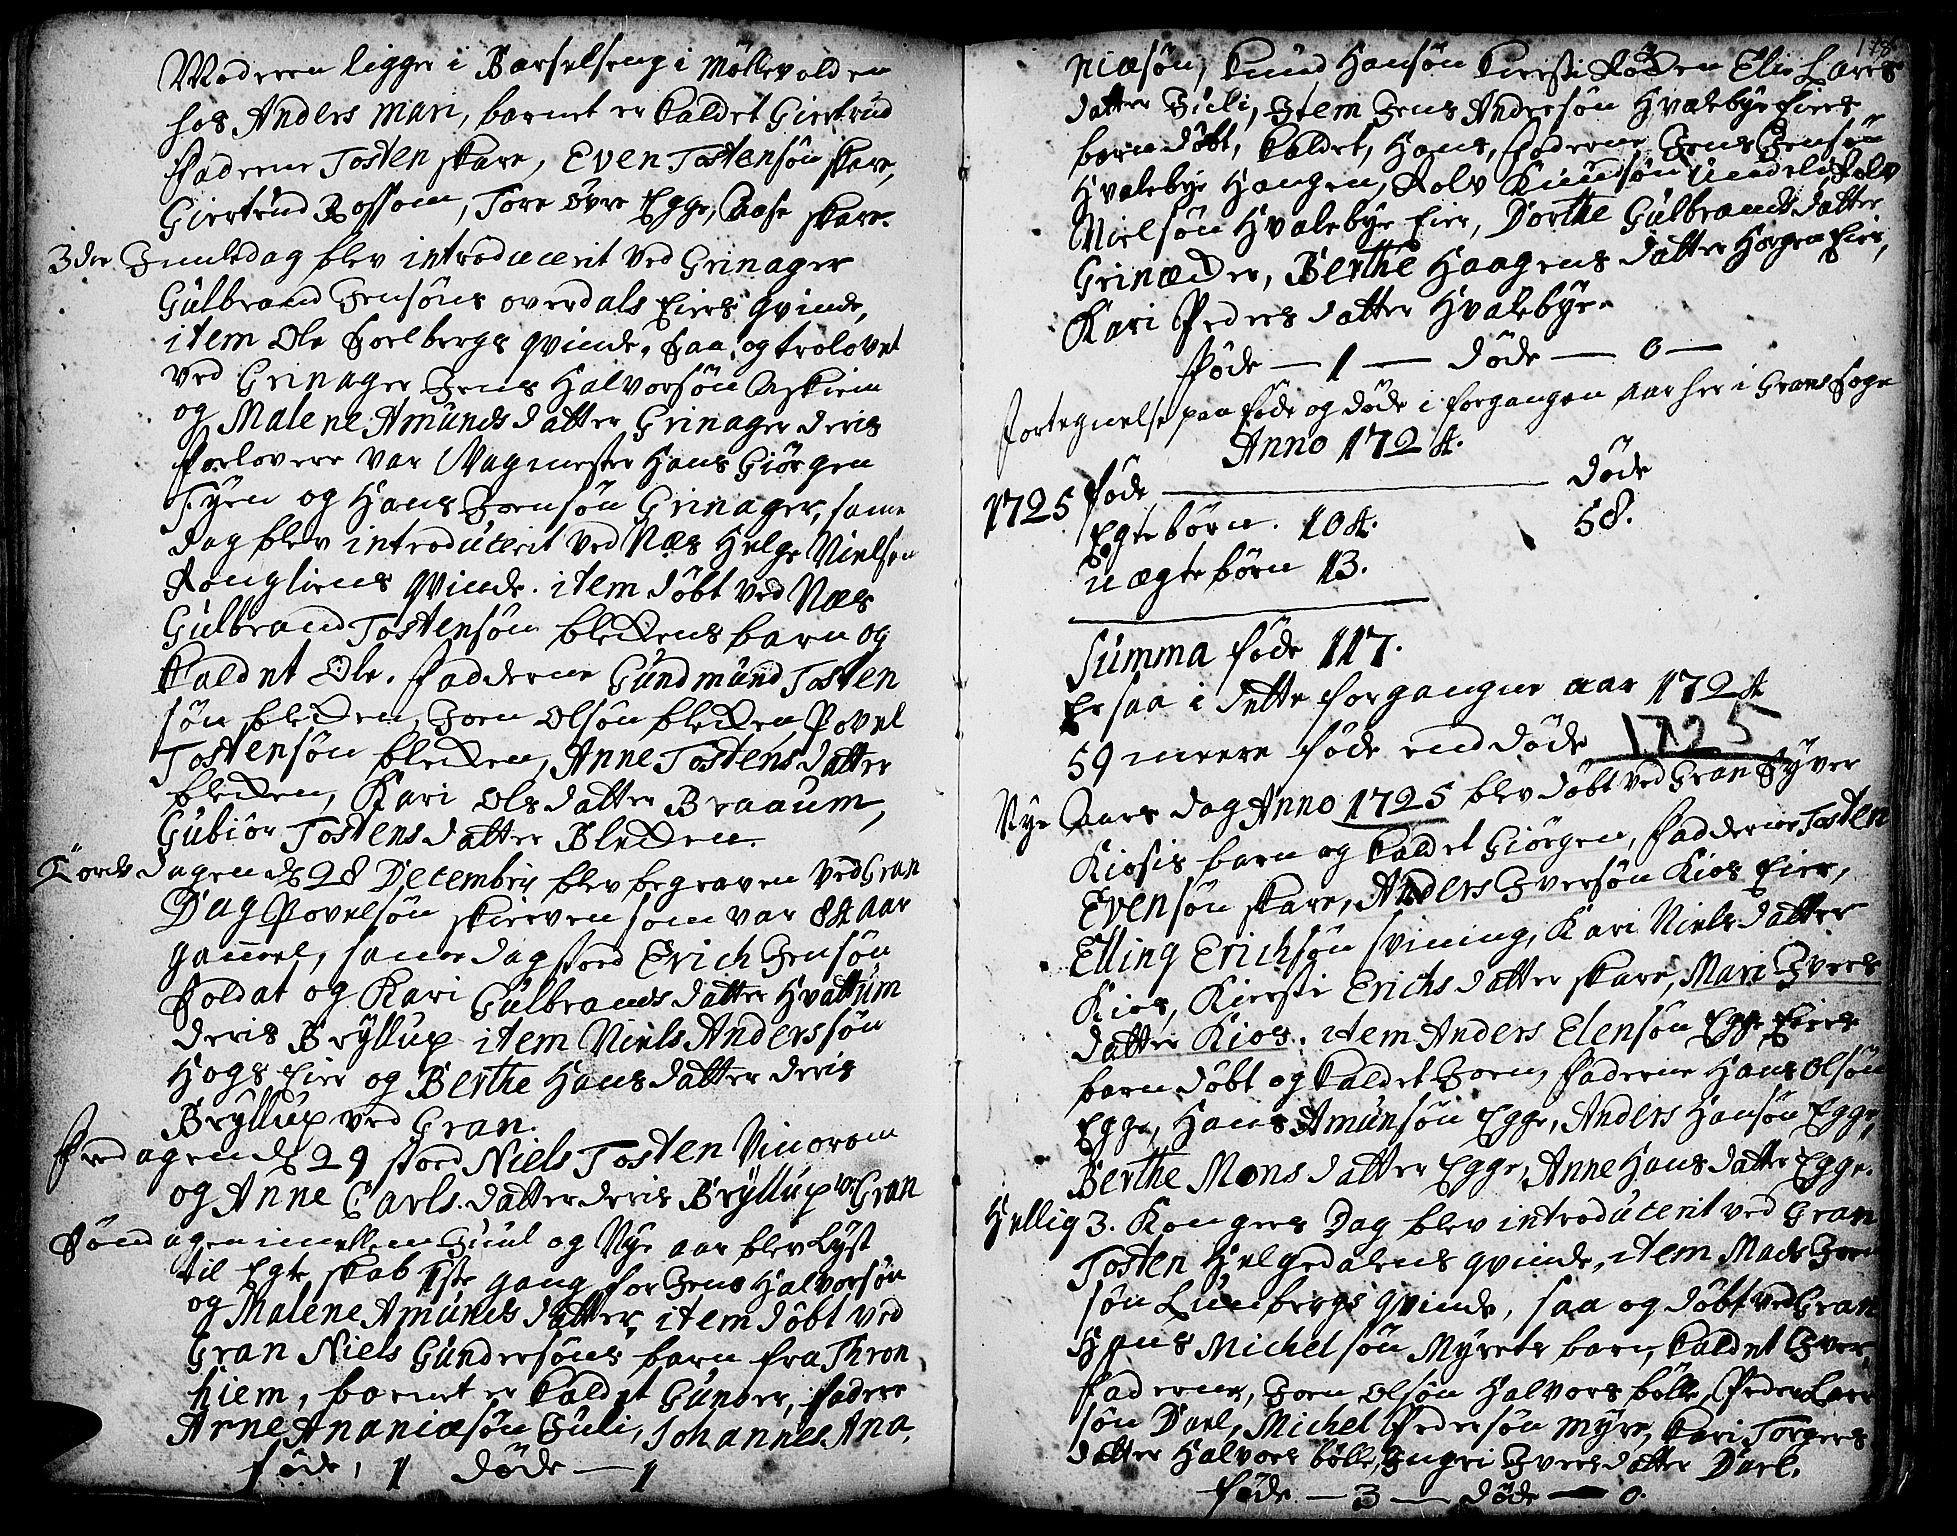 SAH, Gran prestekontor, Ministerialbok nr. 1, 1707-1731, s. 178